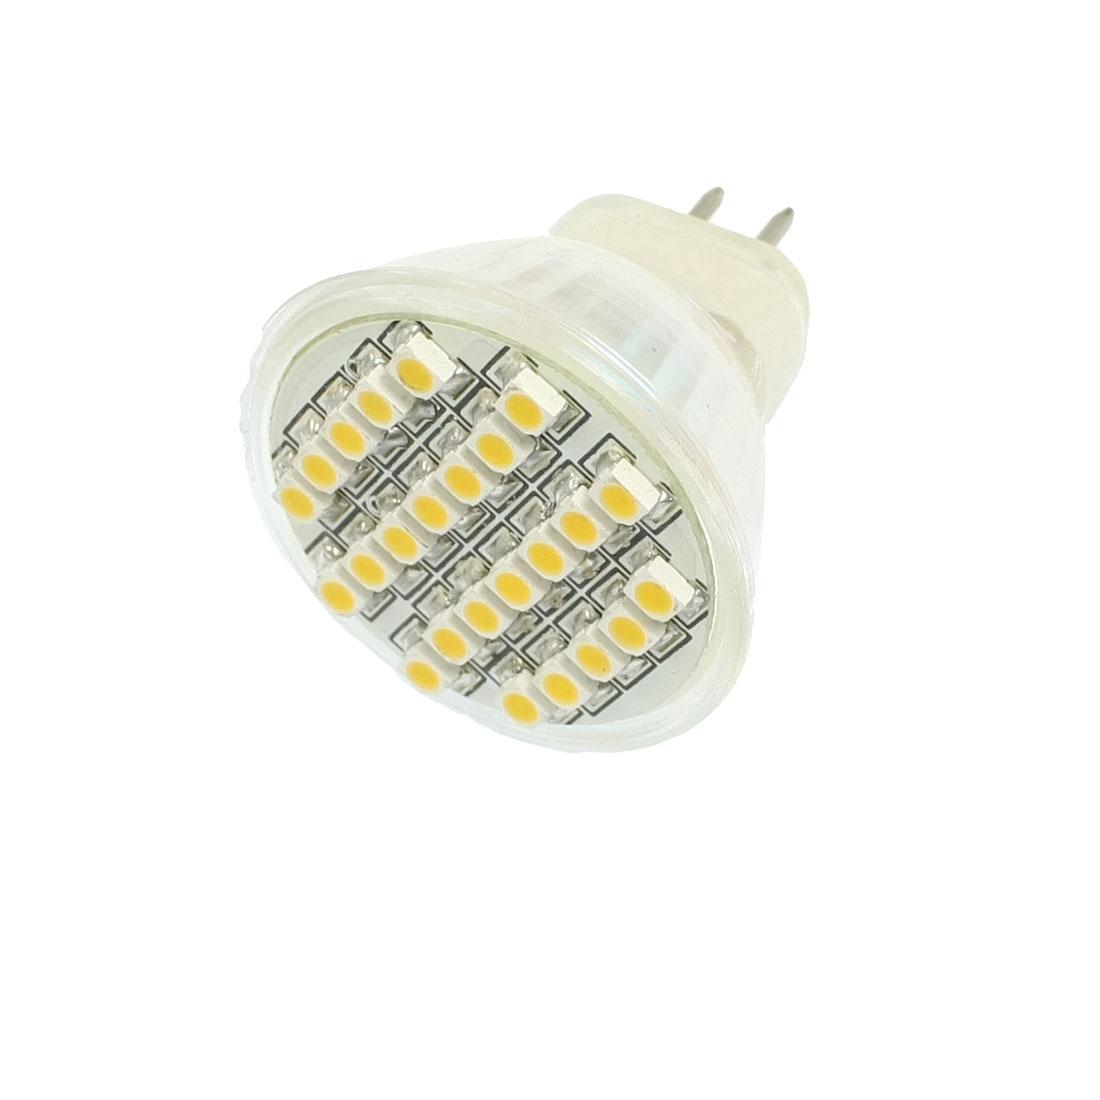 3W Warm White Light Energy Saving MR16 Base 24 SMD LED Corn Bulb 220V